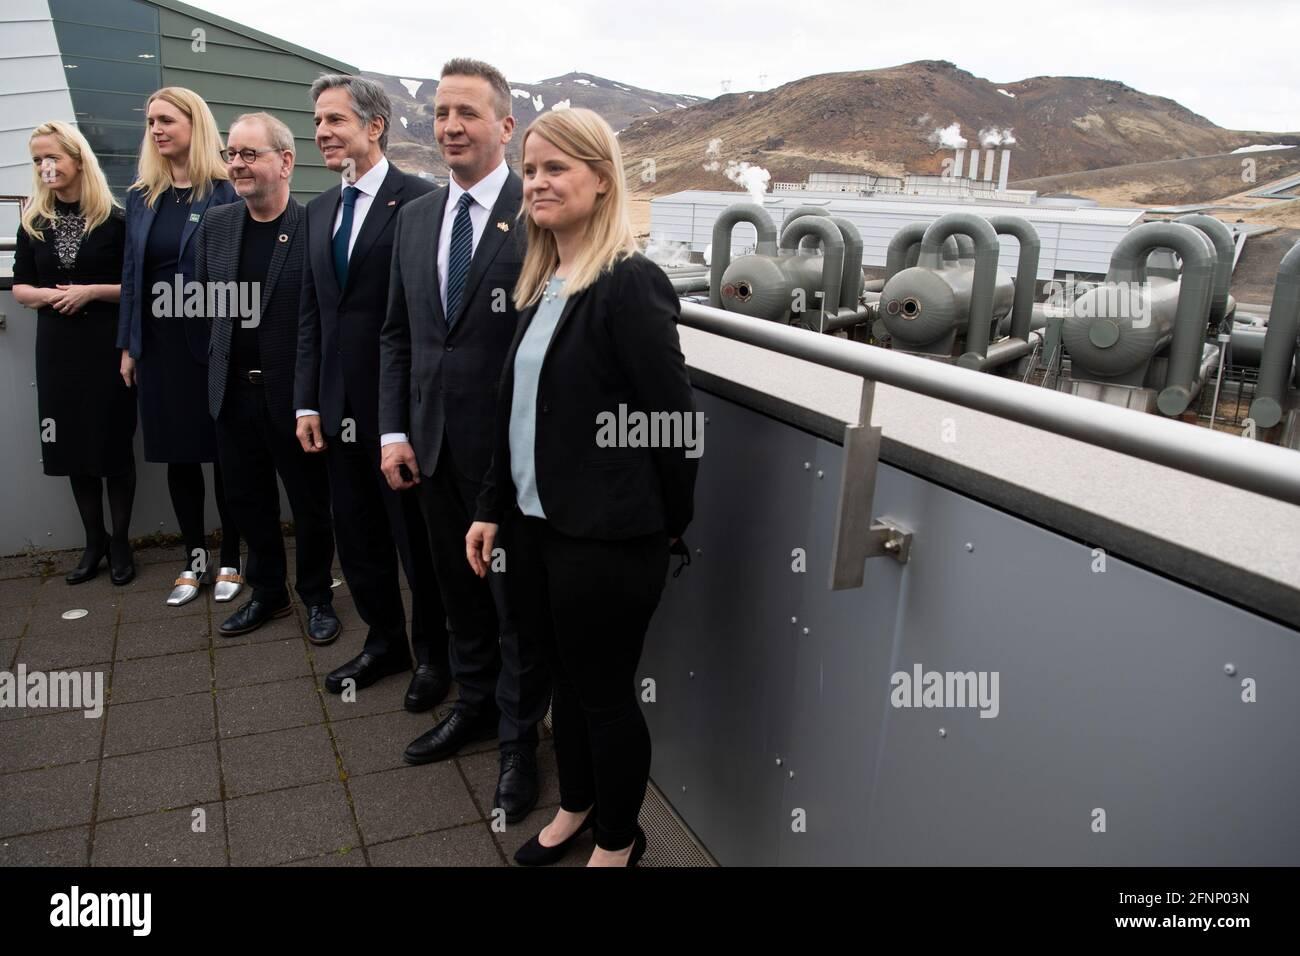 U.S. Secretary of State Antony Blinken stands alongside CEO of Reykjavik Energy Bjarni Bjarnason, and Icelandic Foreign Minister Gudlaugur Thor Thordarson, during a tour to the Hellisheidi Geothermal Plant, in Hengill, Iceland May 18, 2021. Saul Loeb/Pool via REUTERS Stock Photo